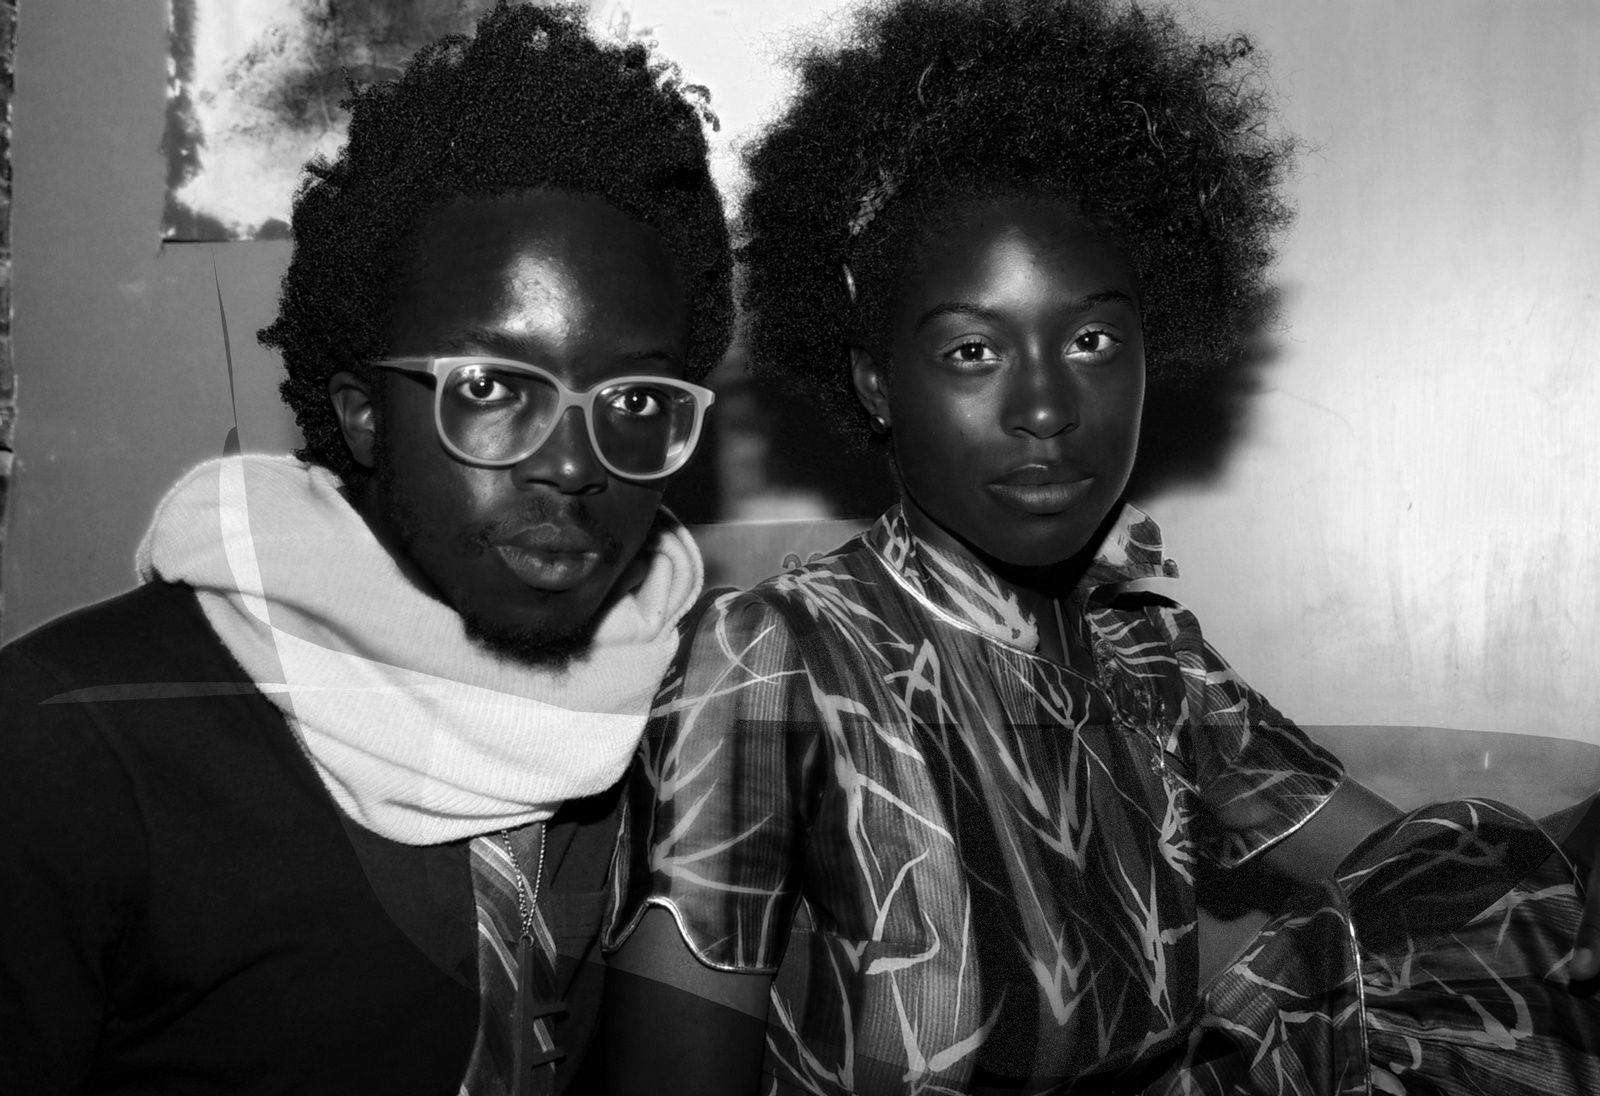 Kwesi Abbensetts - The Portrait